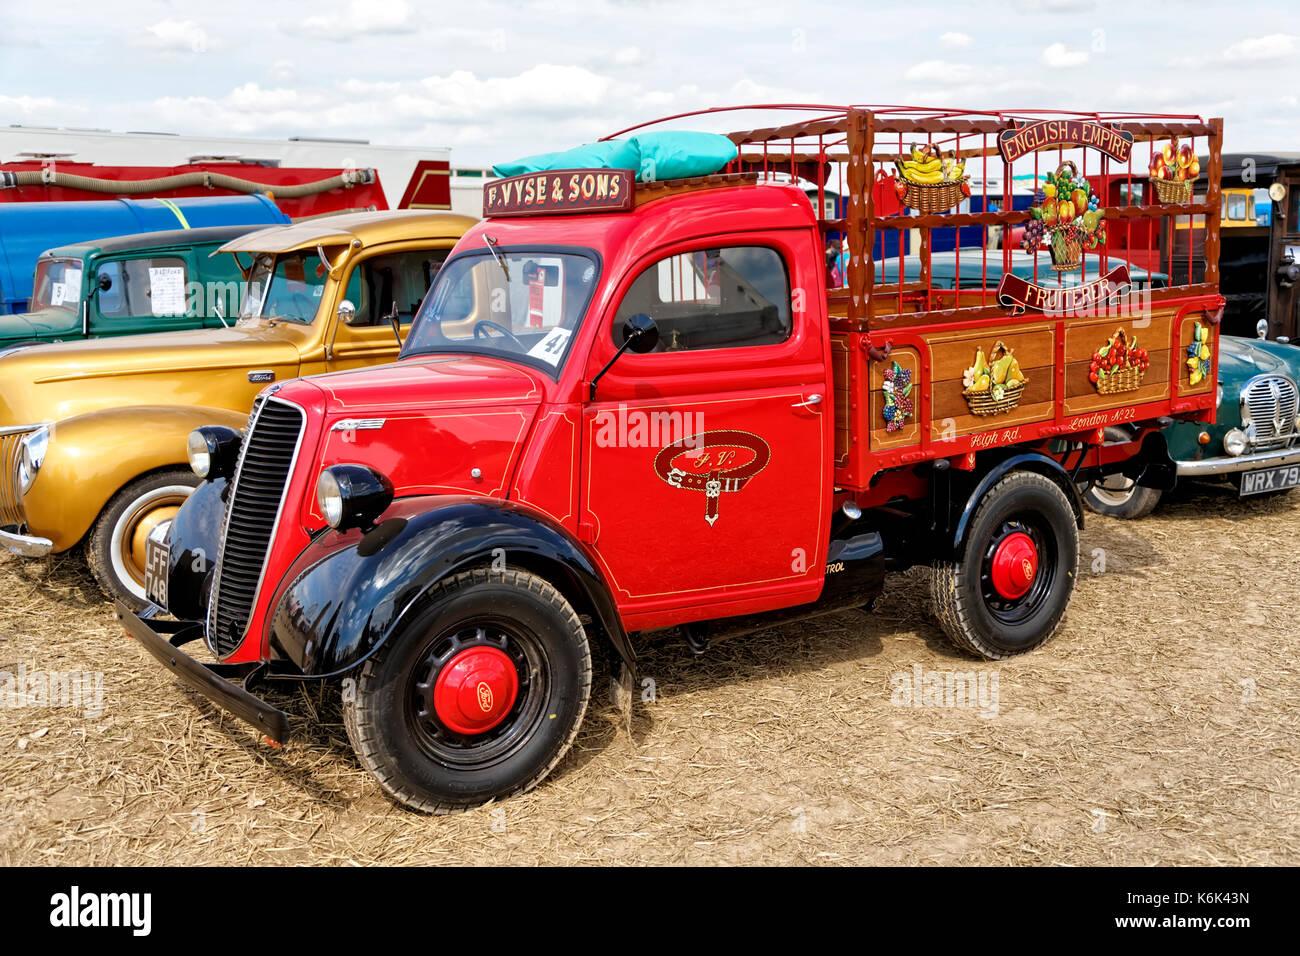 A 1955 Ford E83W Reg. No. LFF 748 at the 2017 Great Dorset Steam Fair, Tarrant Hinton, Blandford, Dorset, United - Stock Image